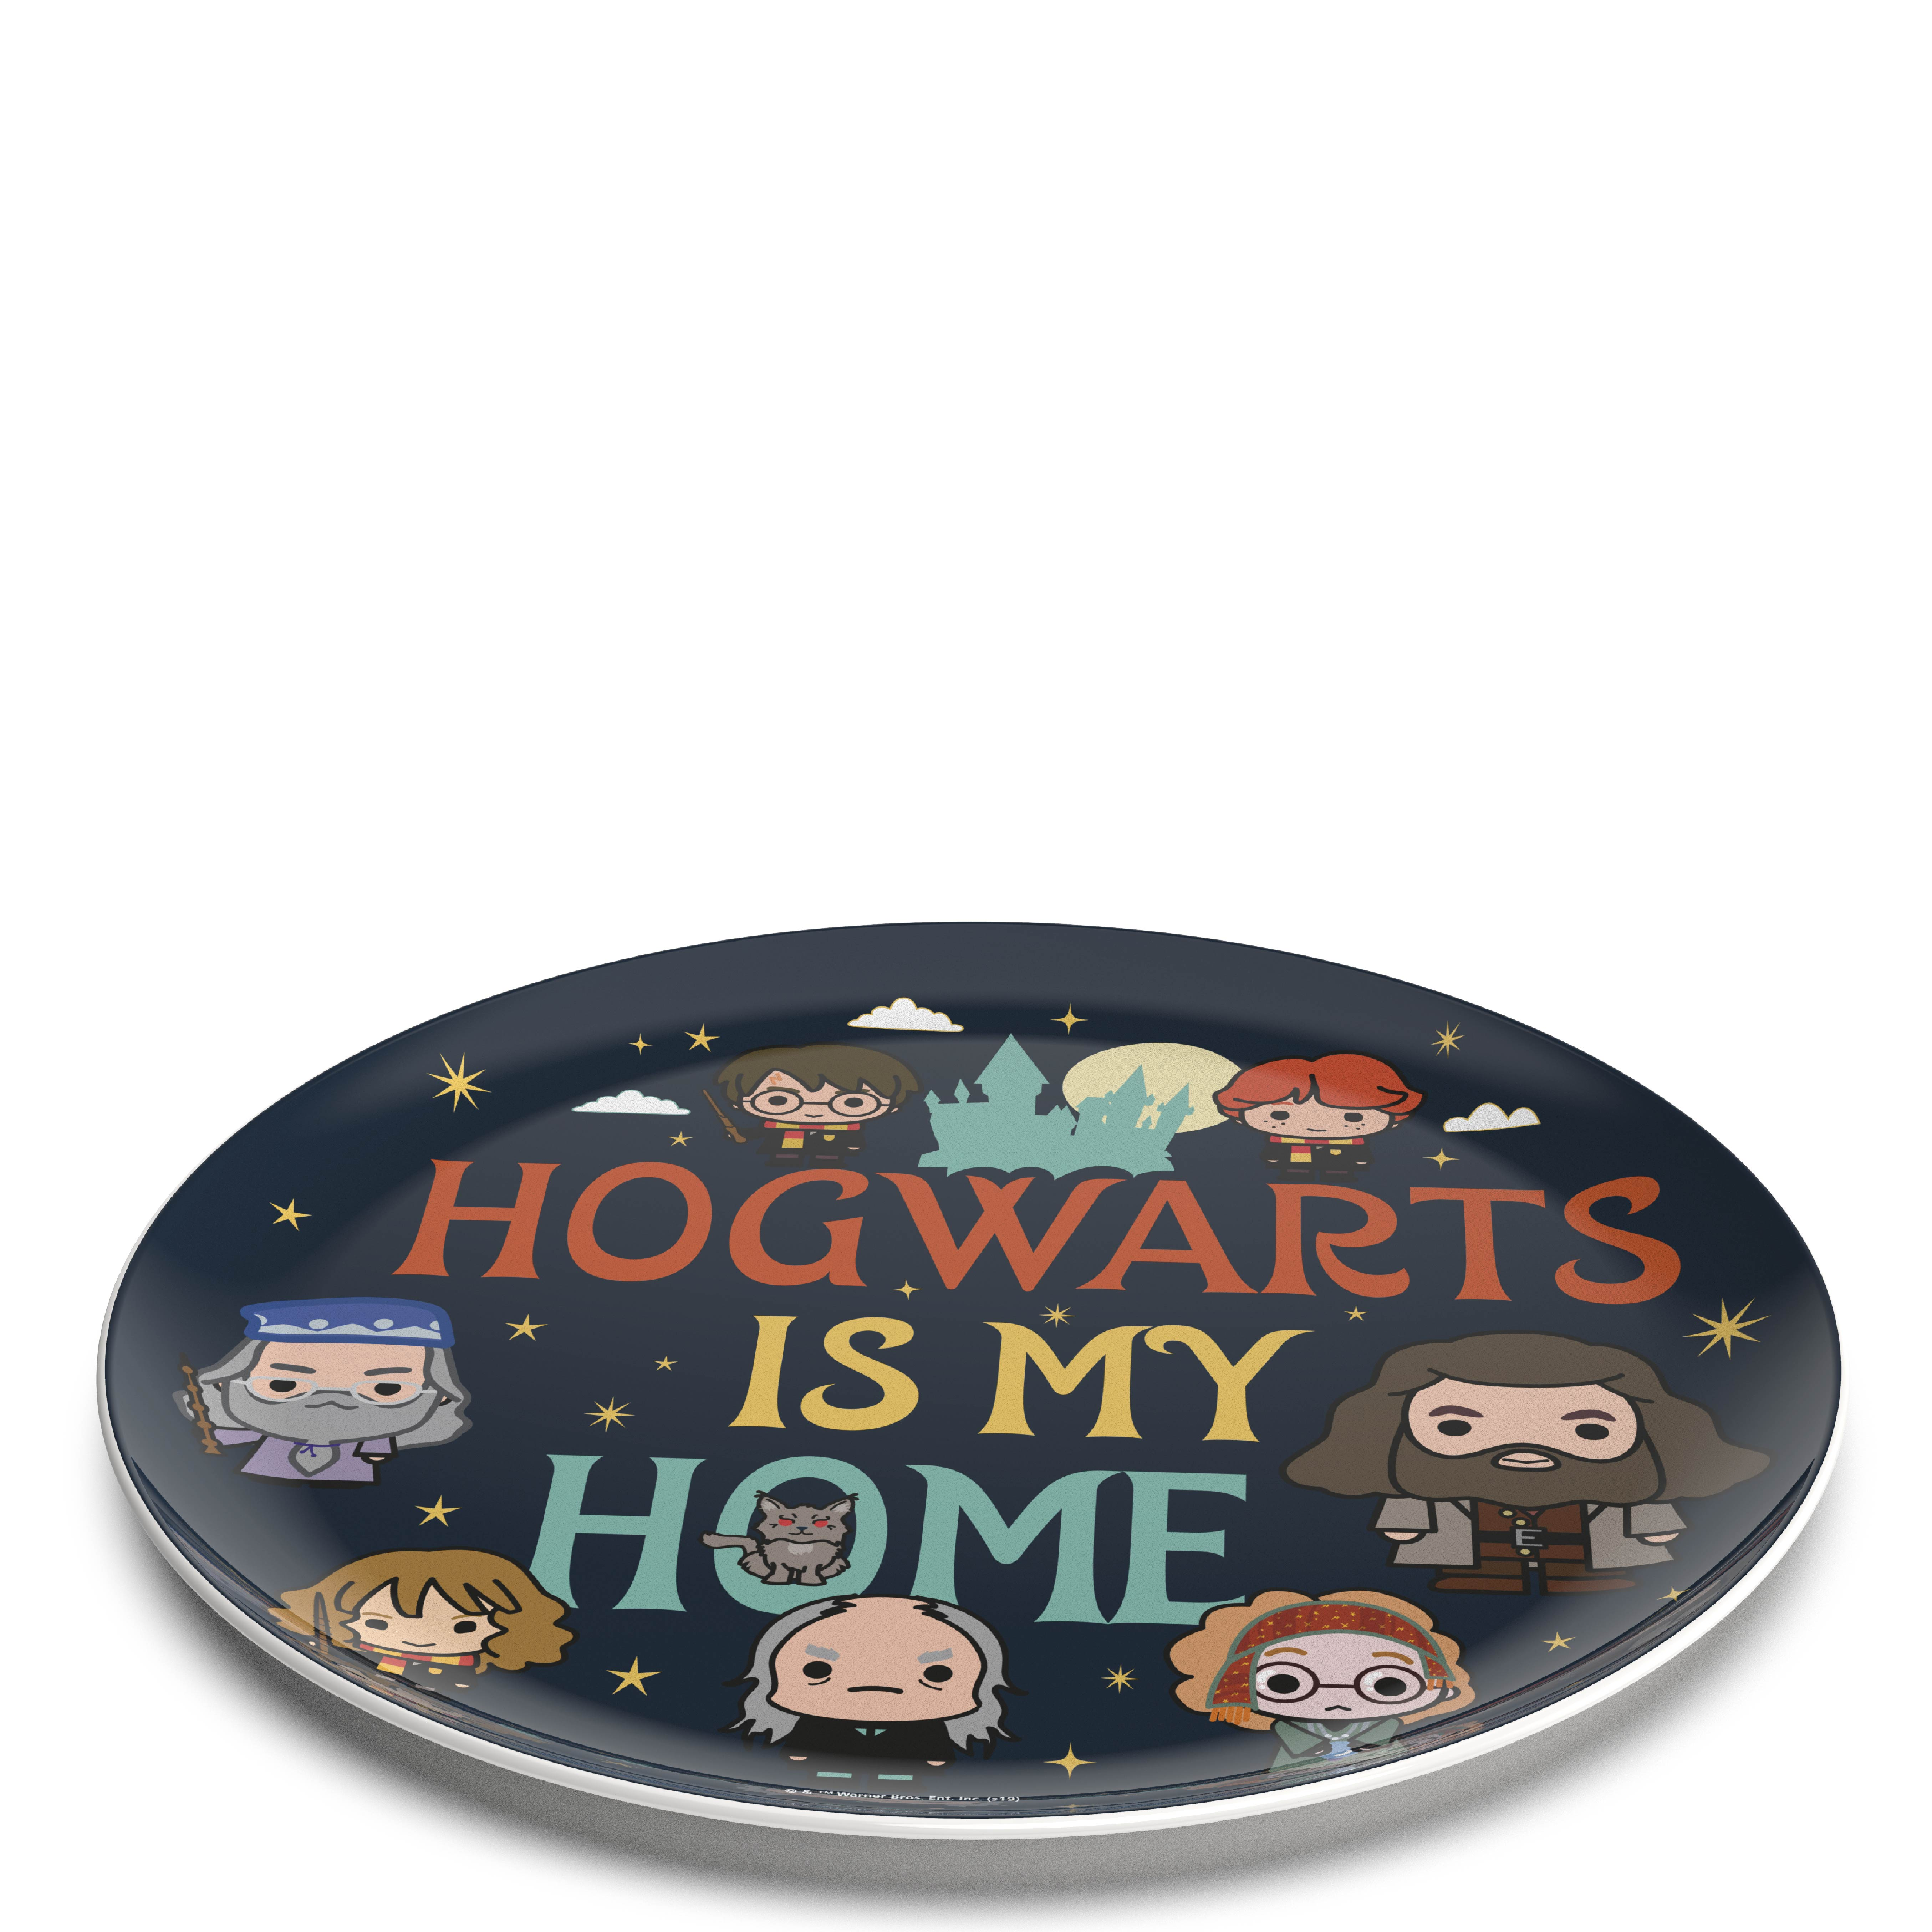 Harry Potter Dinnerware Set, Hogwarts is my Home, 2-piece set slideshow image 5